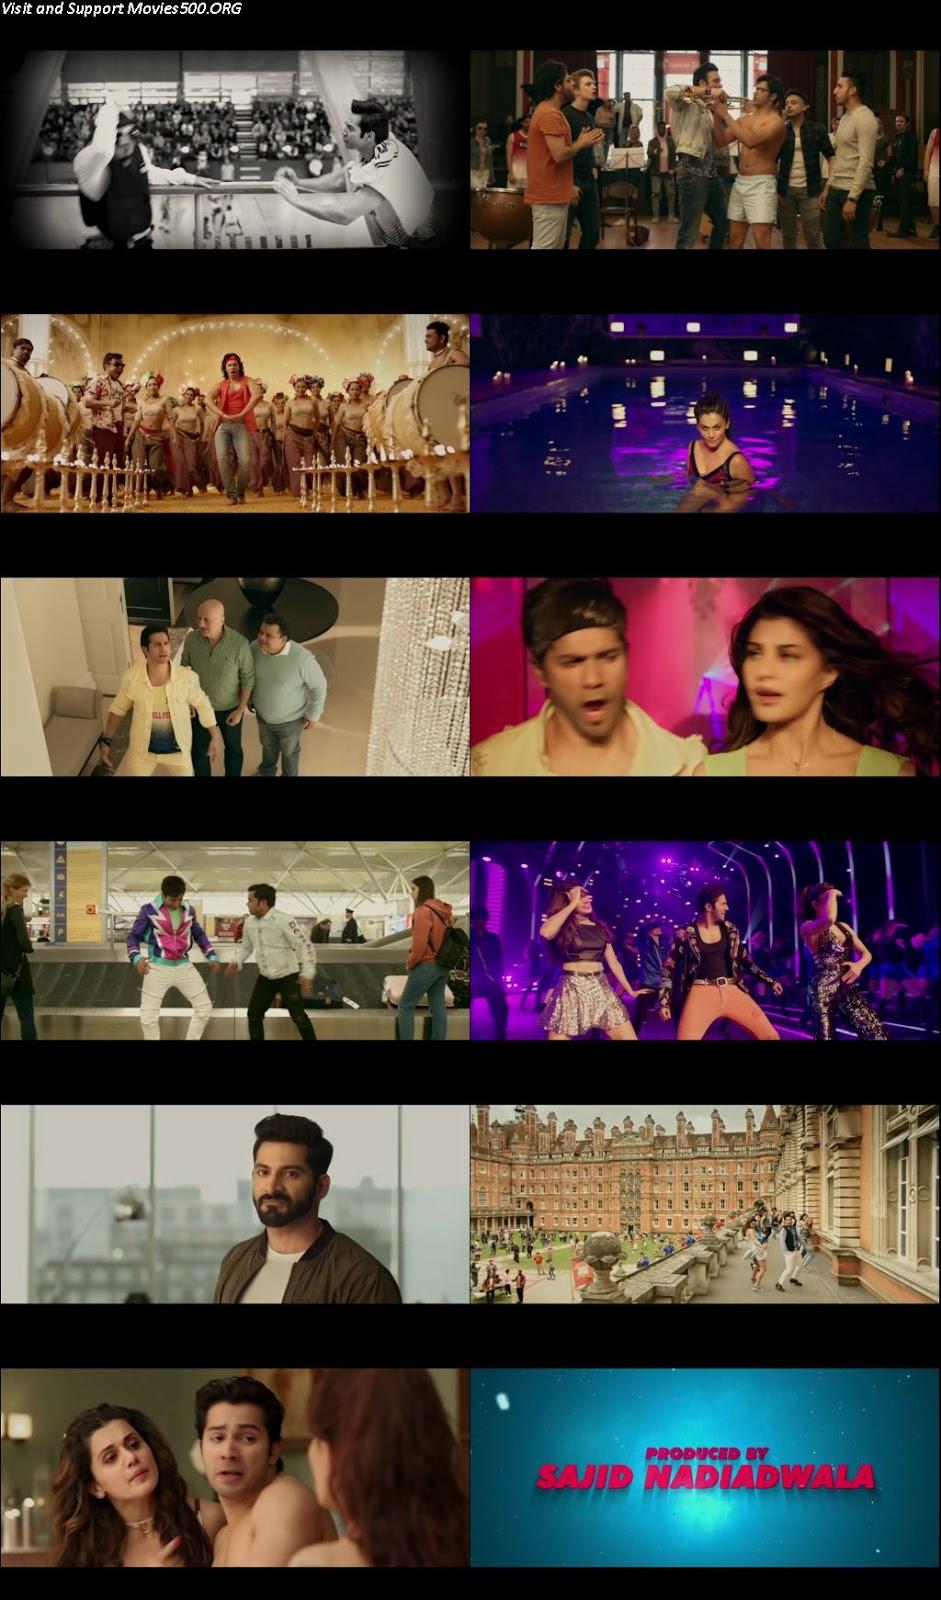 Judwaa 2 2017 Hindi Movie Official Trailer Download 720P at movies500.me